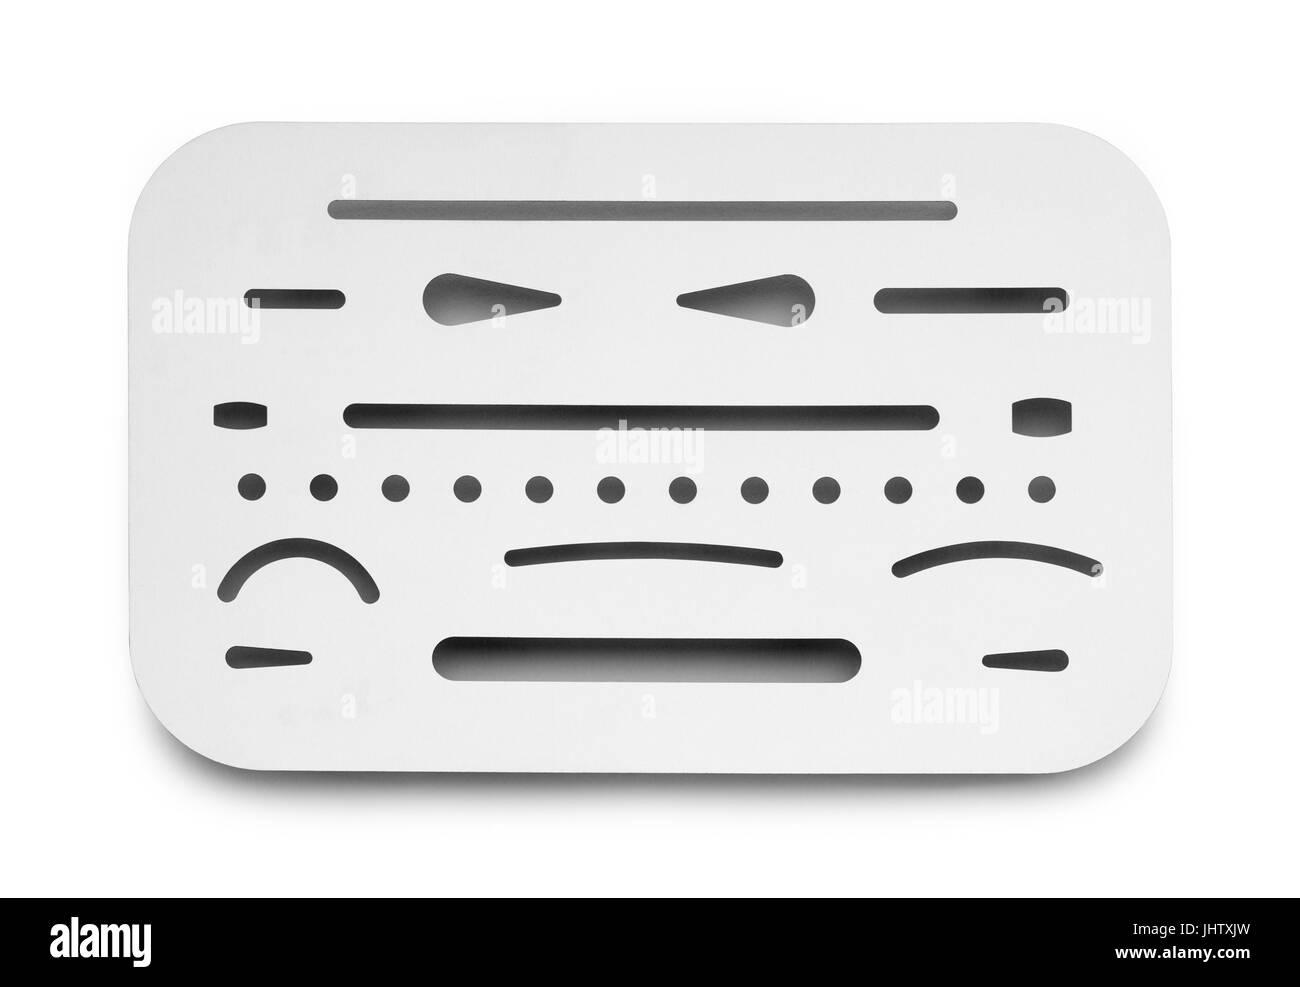 Metal Flat Drafting Eraser Shield Isolated on White Background. - Stock Image